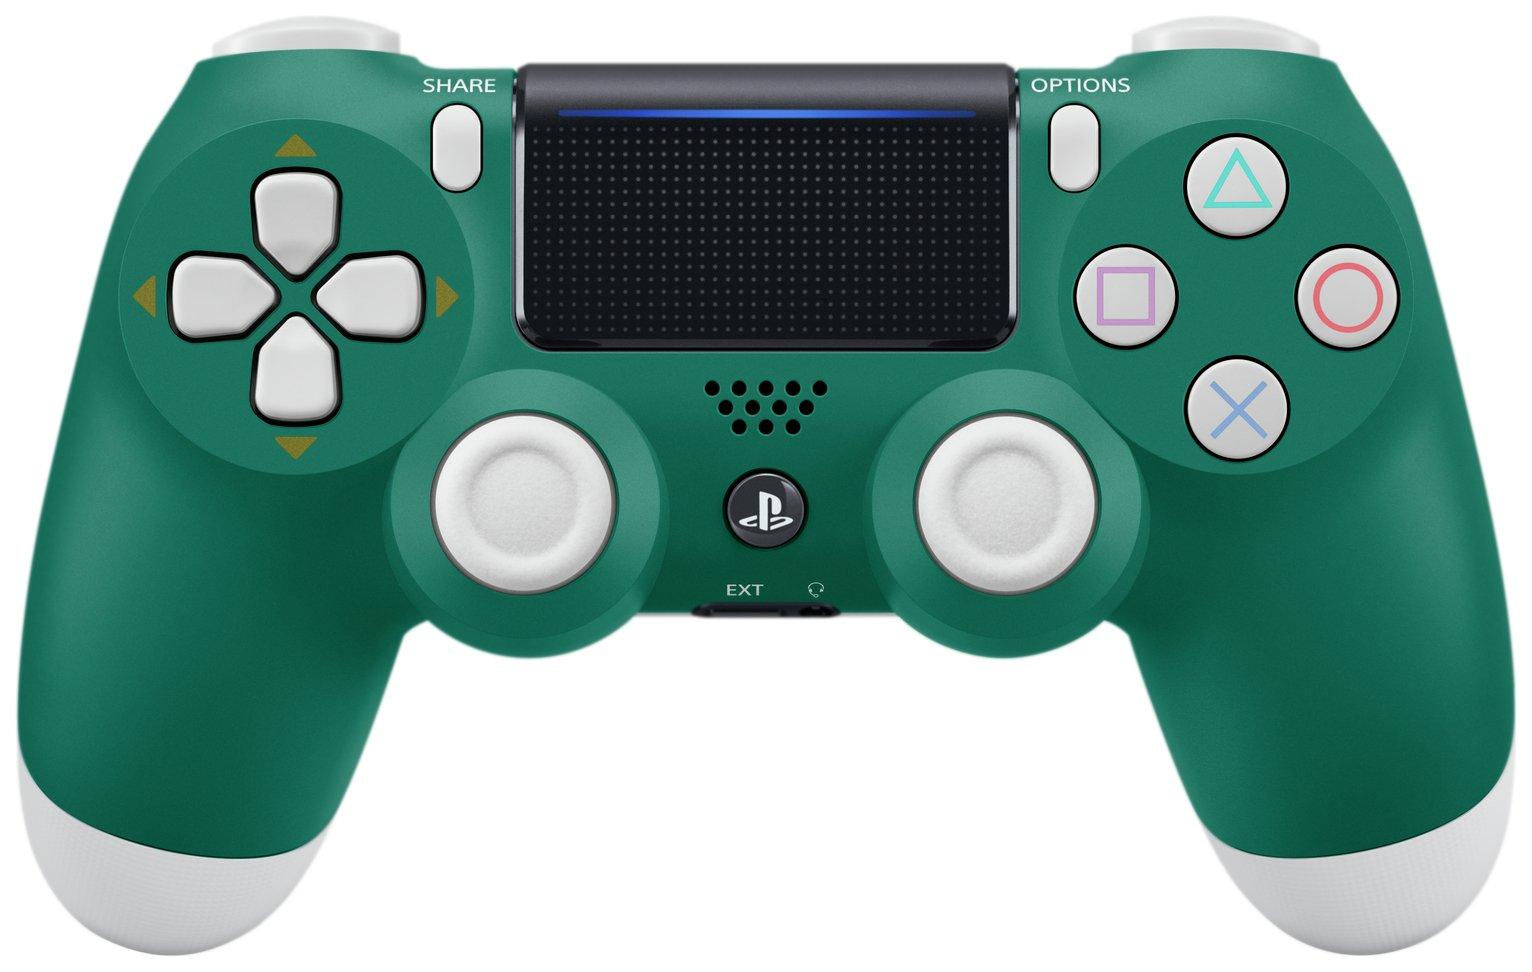 Sony PS4 DualShock 4 V2 Wireless Controller - Alpine Green